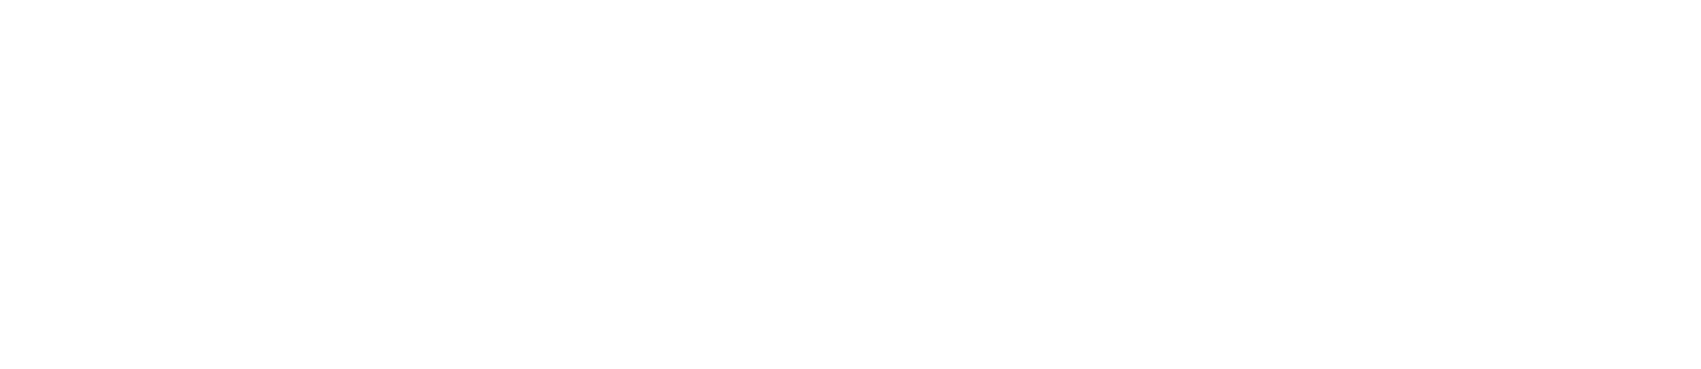 2019 MET Logo-02.png